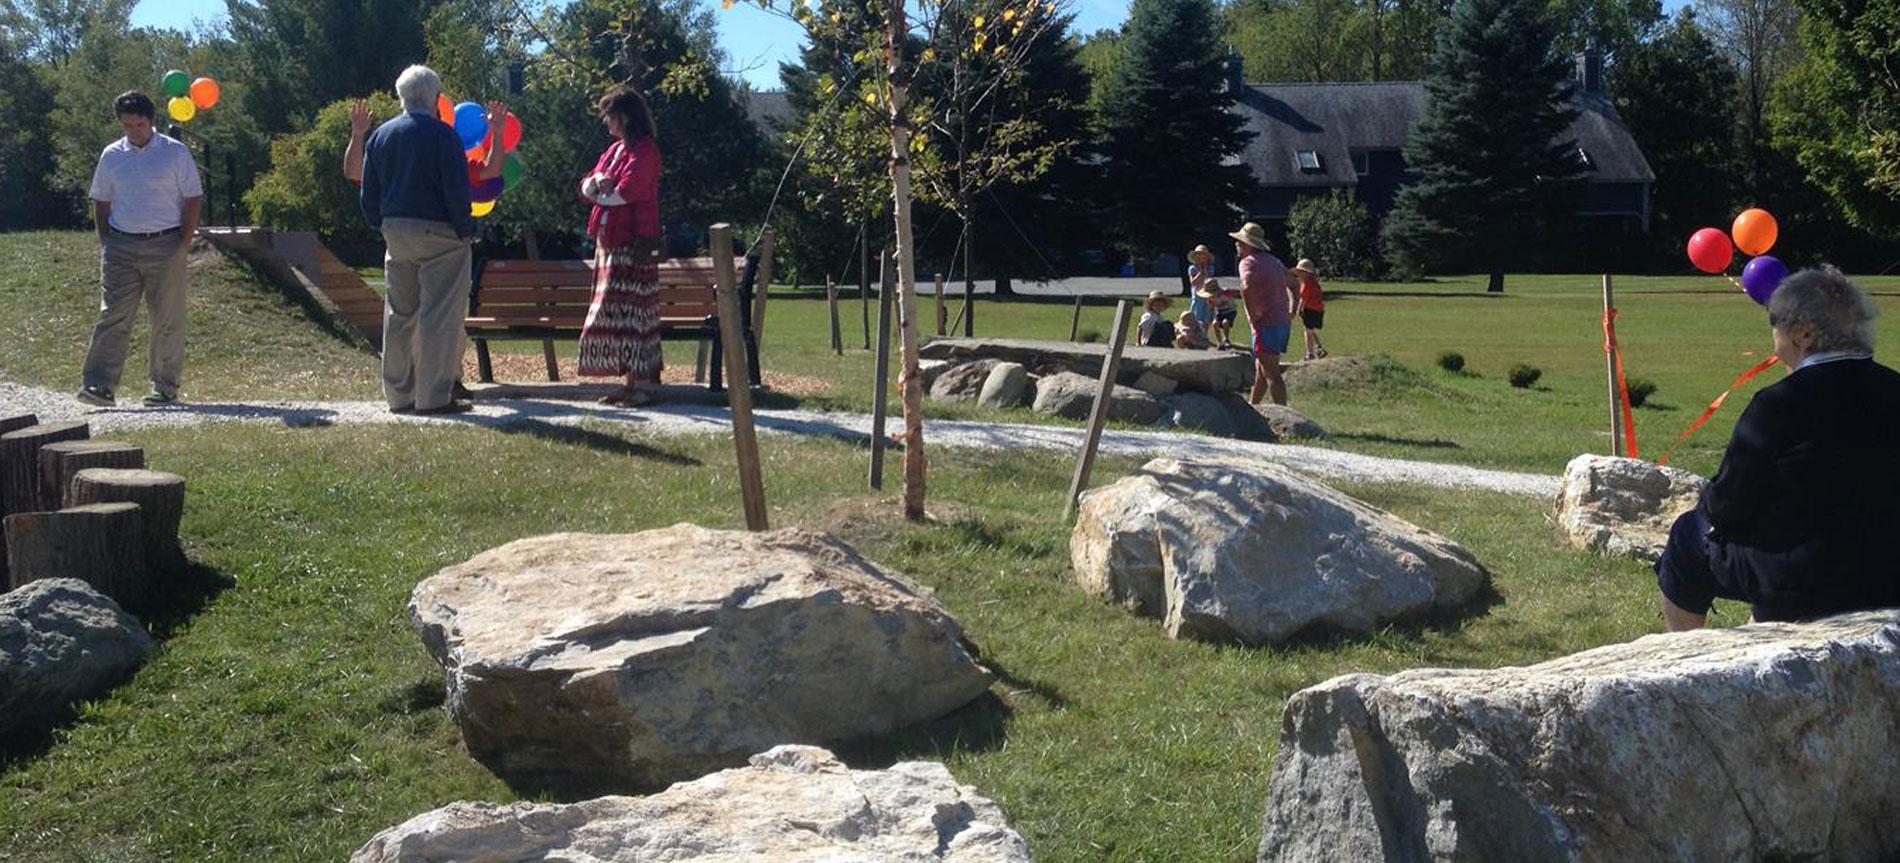 Davis Park Playground, Shelburne, VT